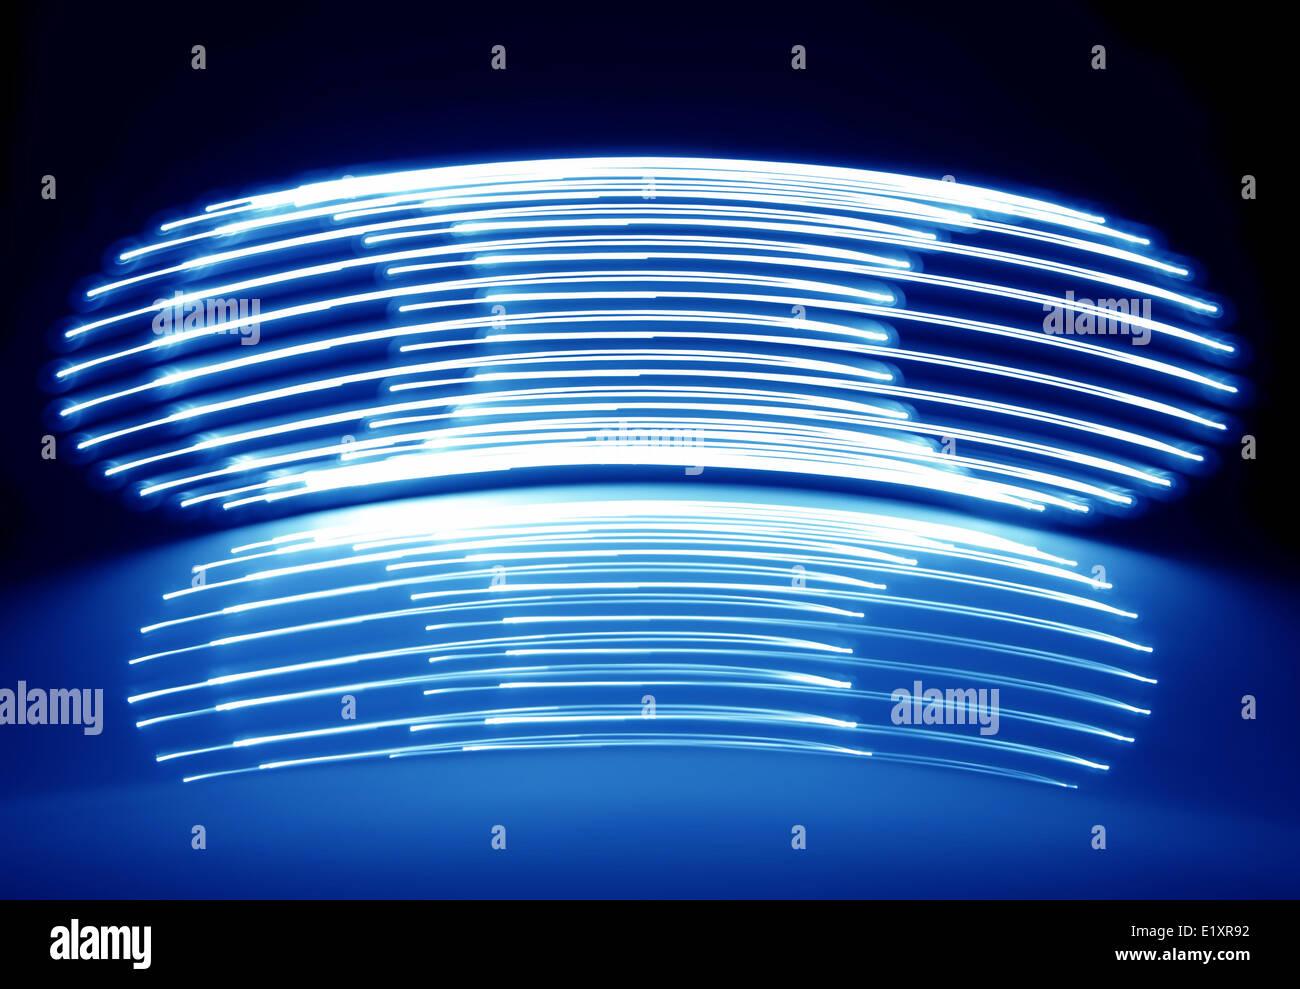 Abstract Neon Lights - Stock Image